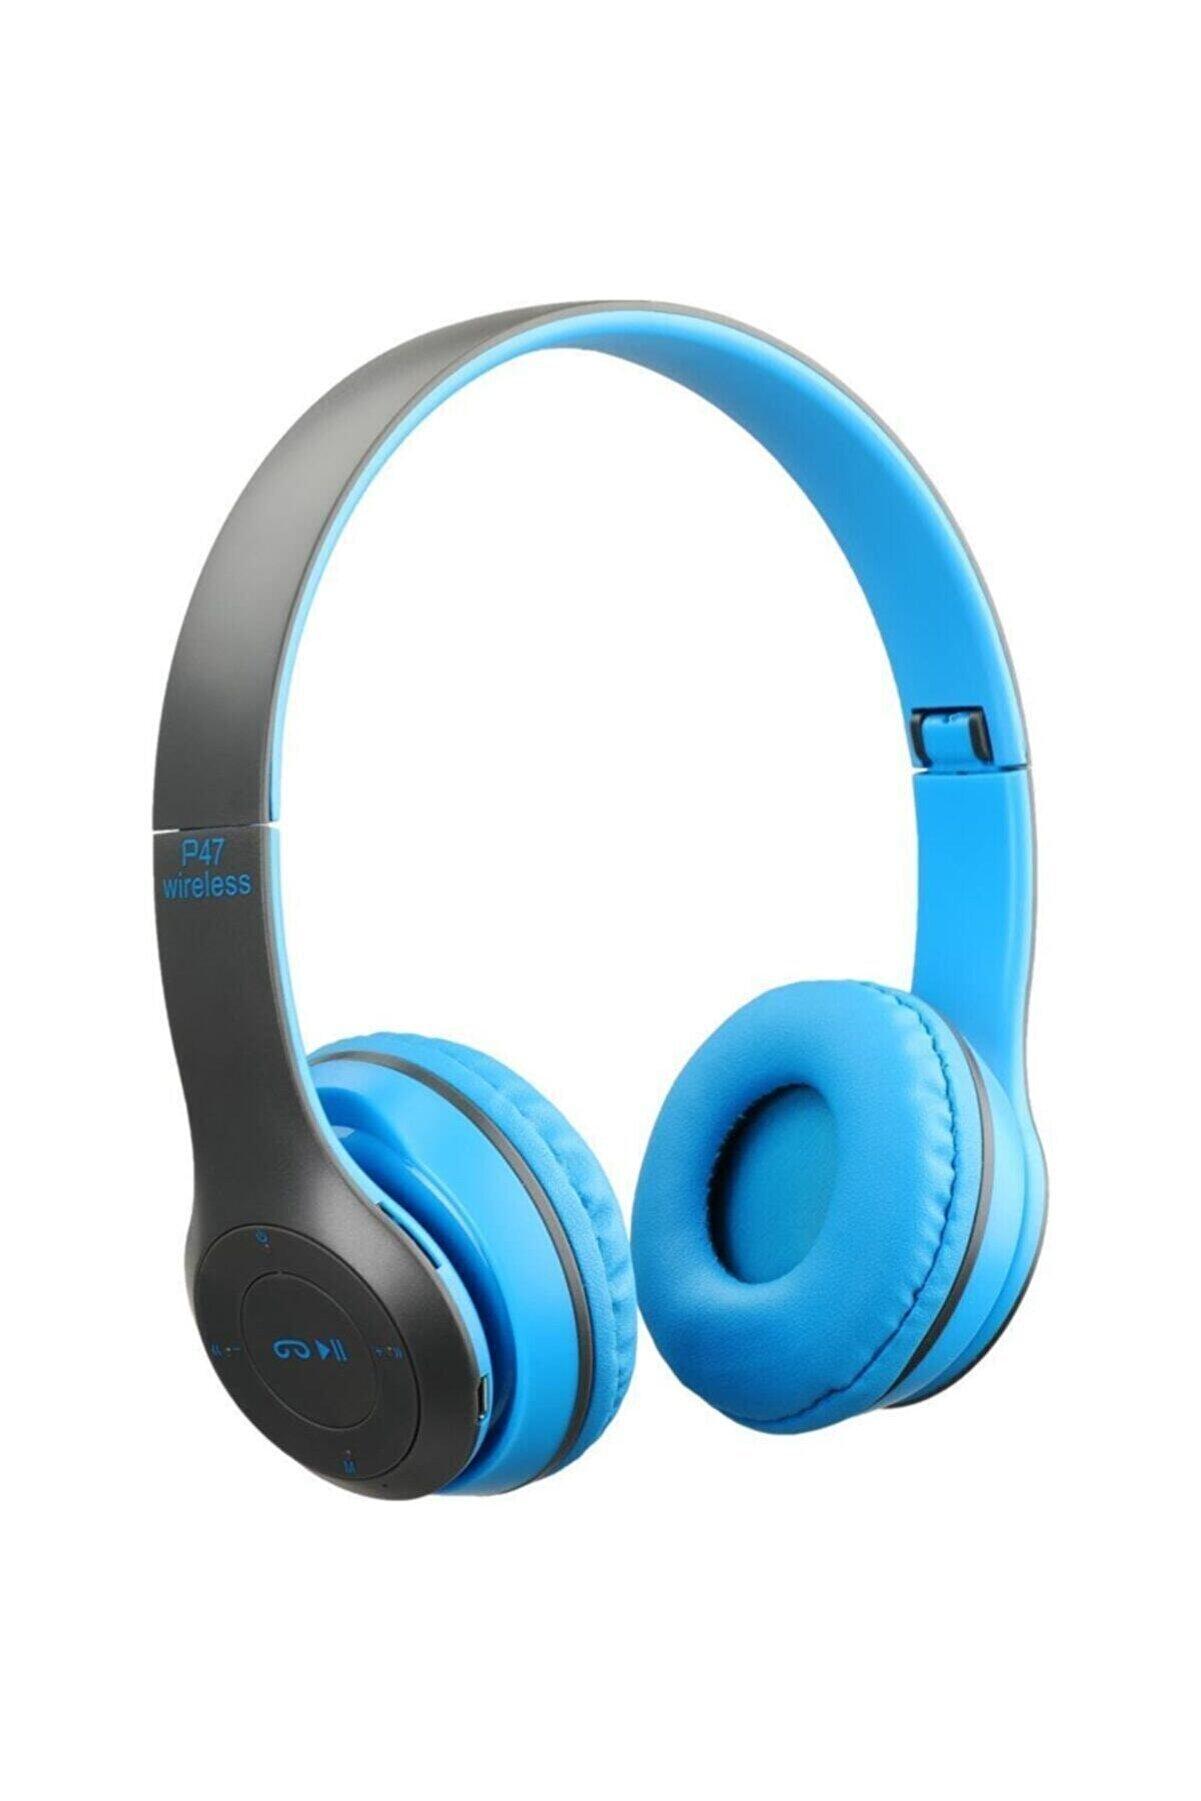 Torima P47 Extra Bass Wireless Bluetooth Kulaklık 5.0+edr Fm Radyo Mavi